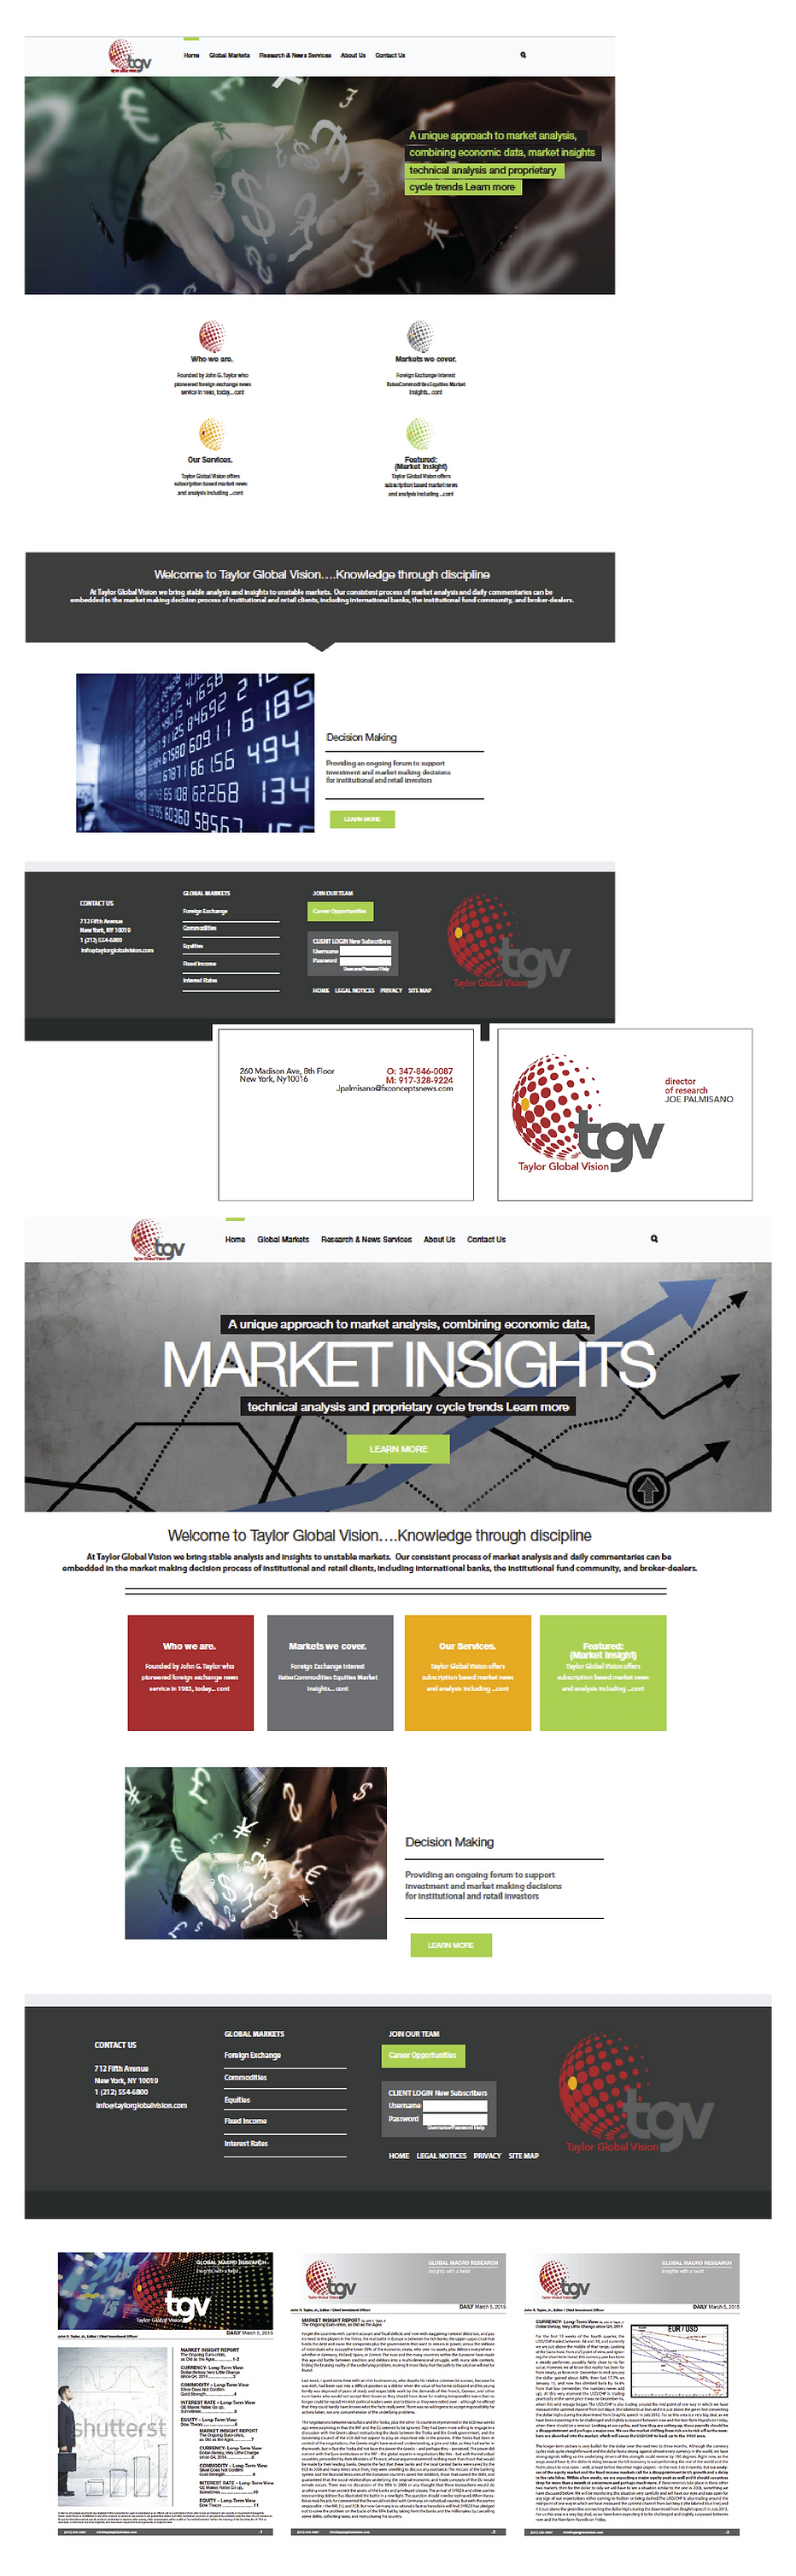 Financial services web design and logo design and letterhead designs